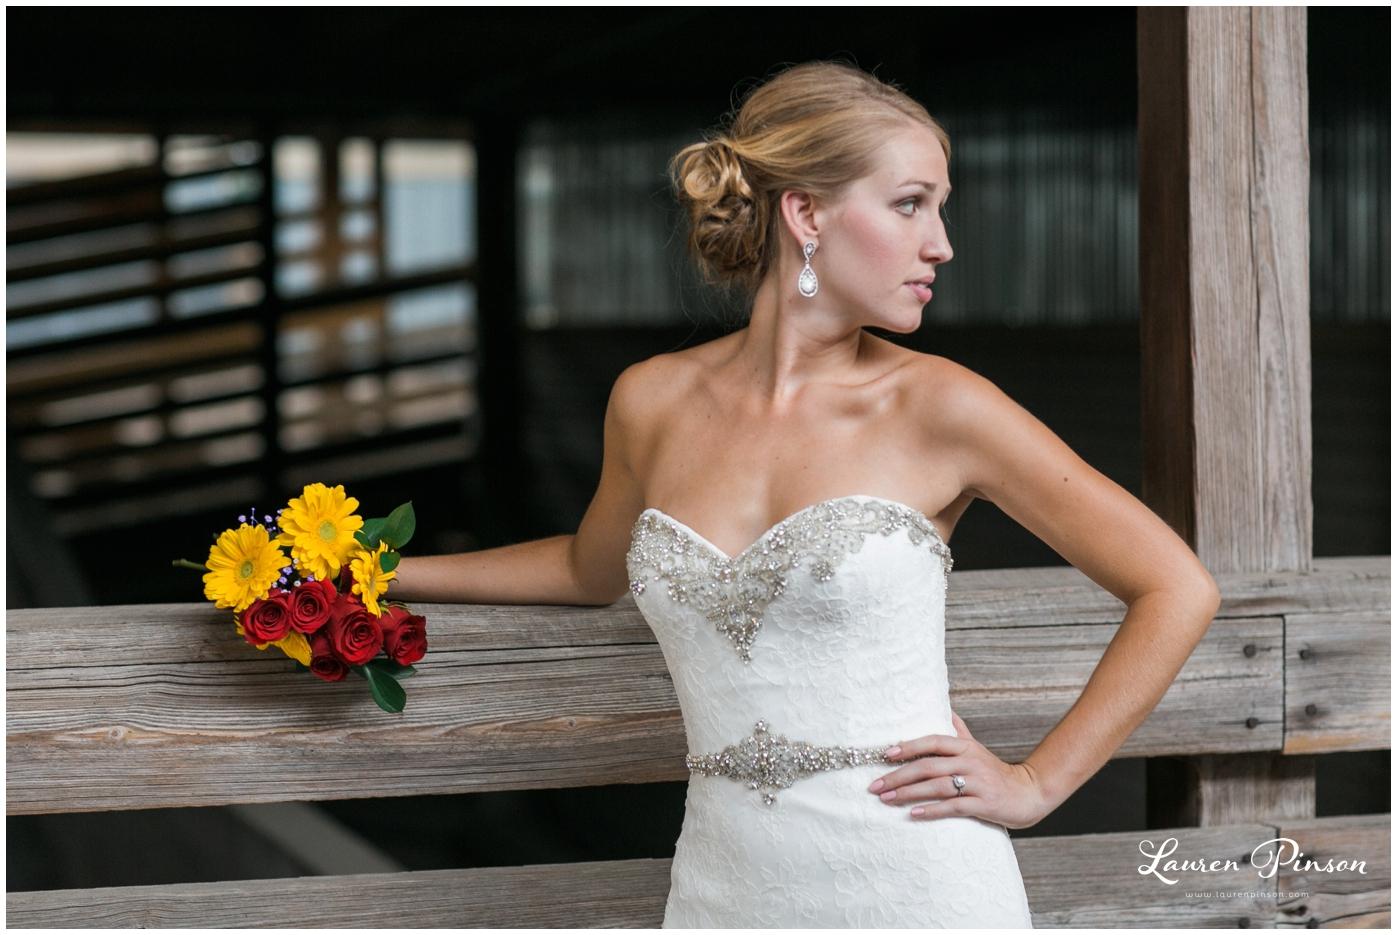 fort-worth-bridal-session-at-the-stockyards-fort-worth-wedding-photographer-wichita-falls-wedding-photographer_1331.jpg